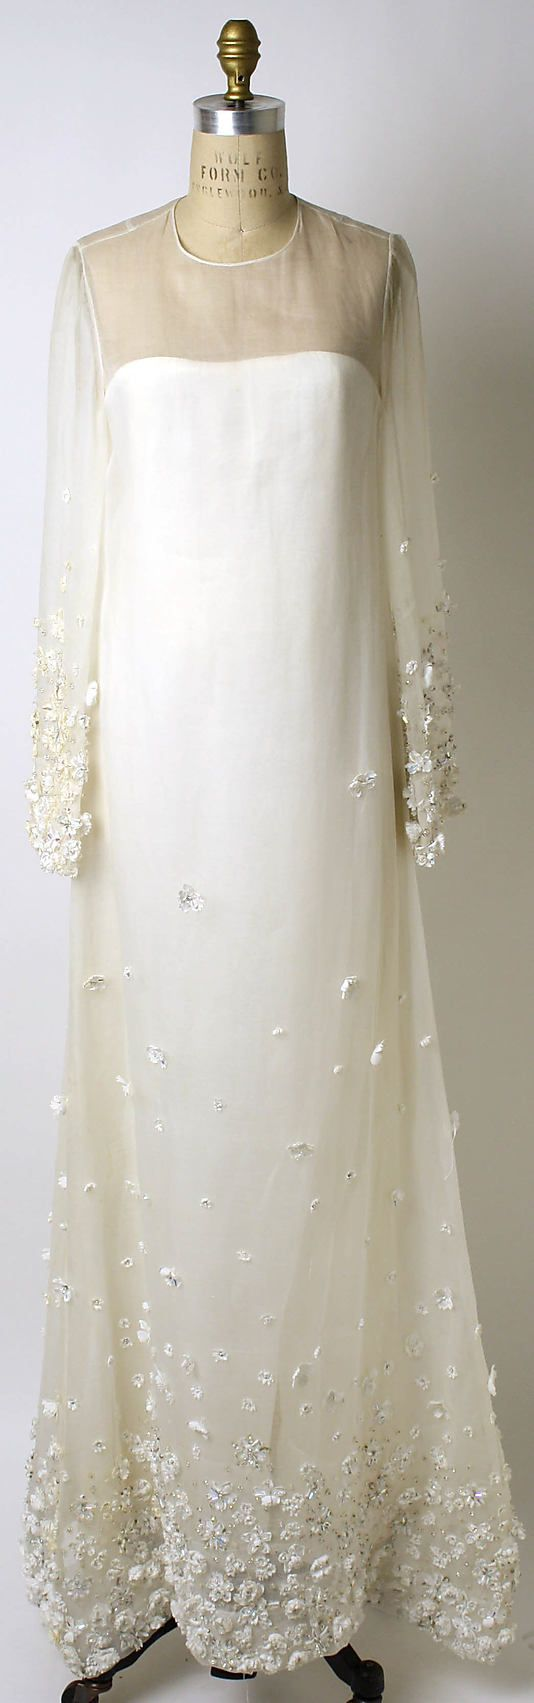 Wedding ensemble Oscar de la Renta, Ltd.  (American, founded 1965) Designer: Oscar de la Renta (American, born Dominican Republic, 1932) Date: 1967 Culture: American Medium: silk, glass